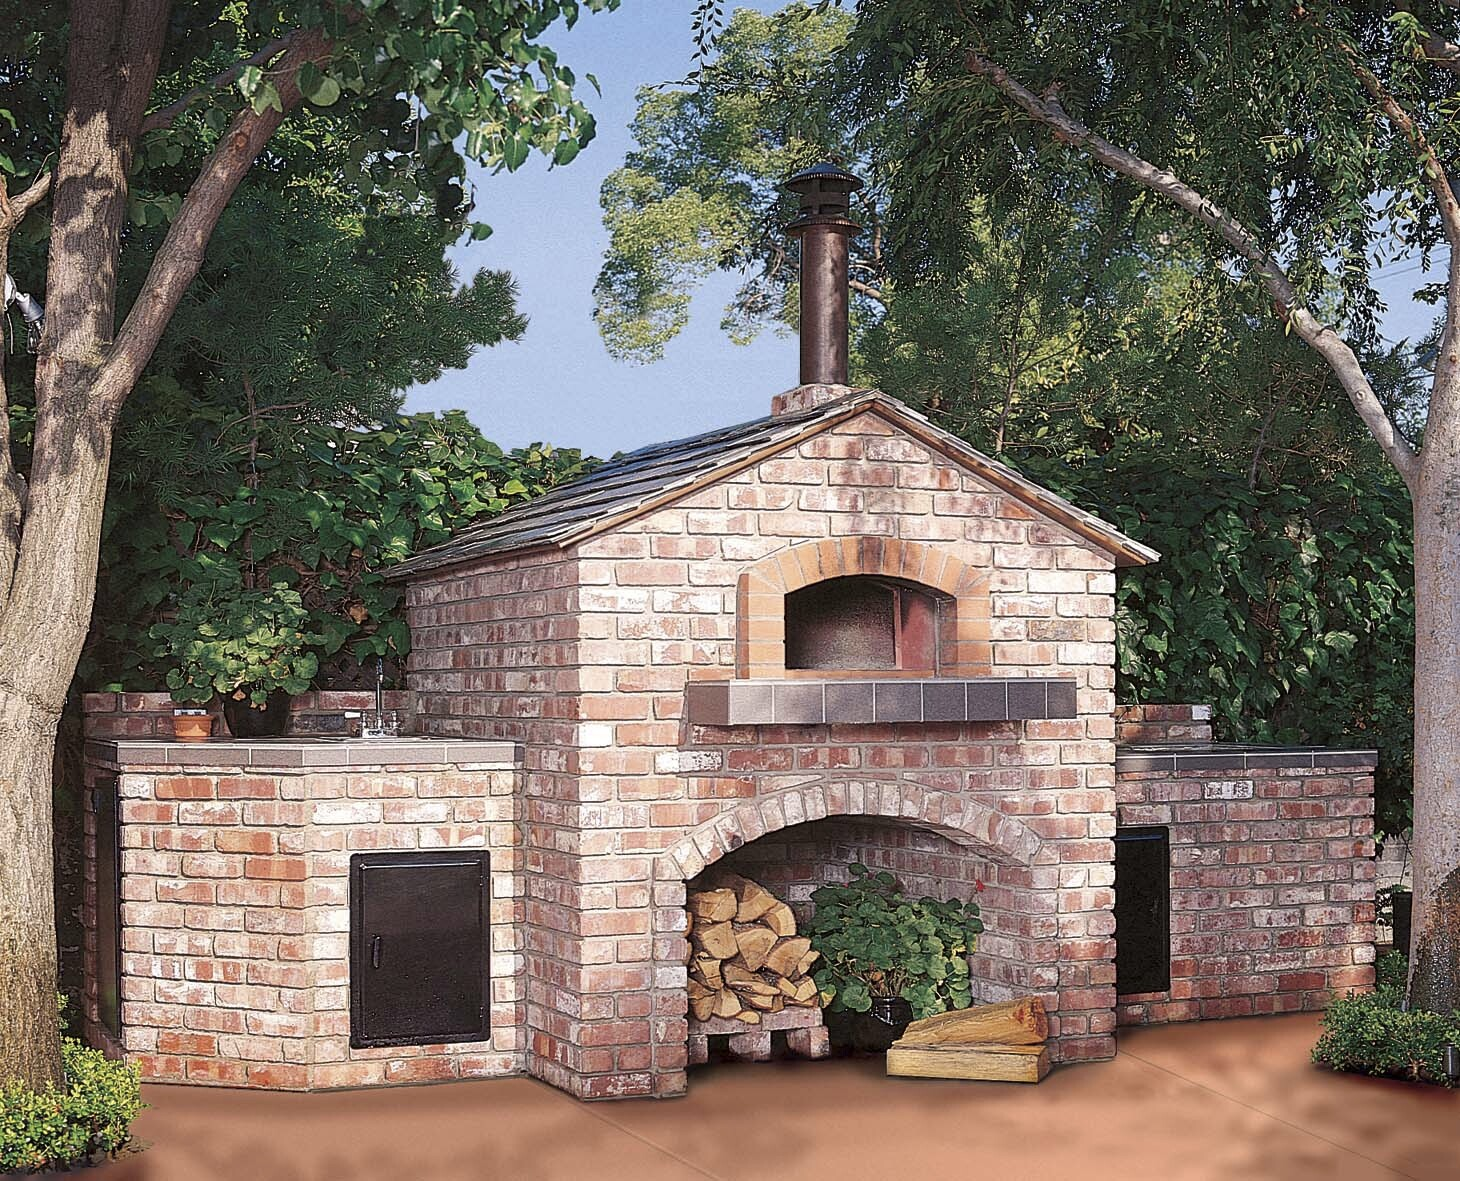 Mugnaini wood fired oven in an outdoor setting